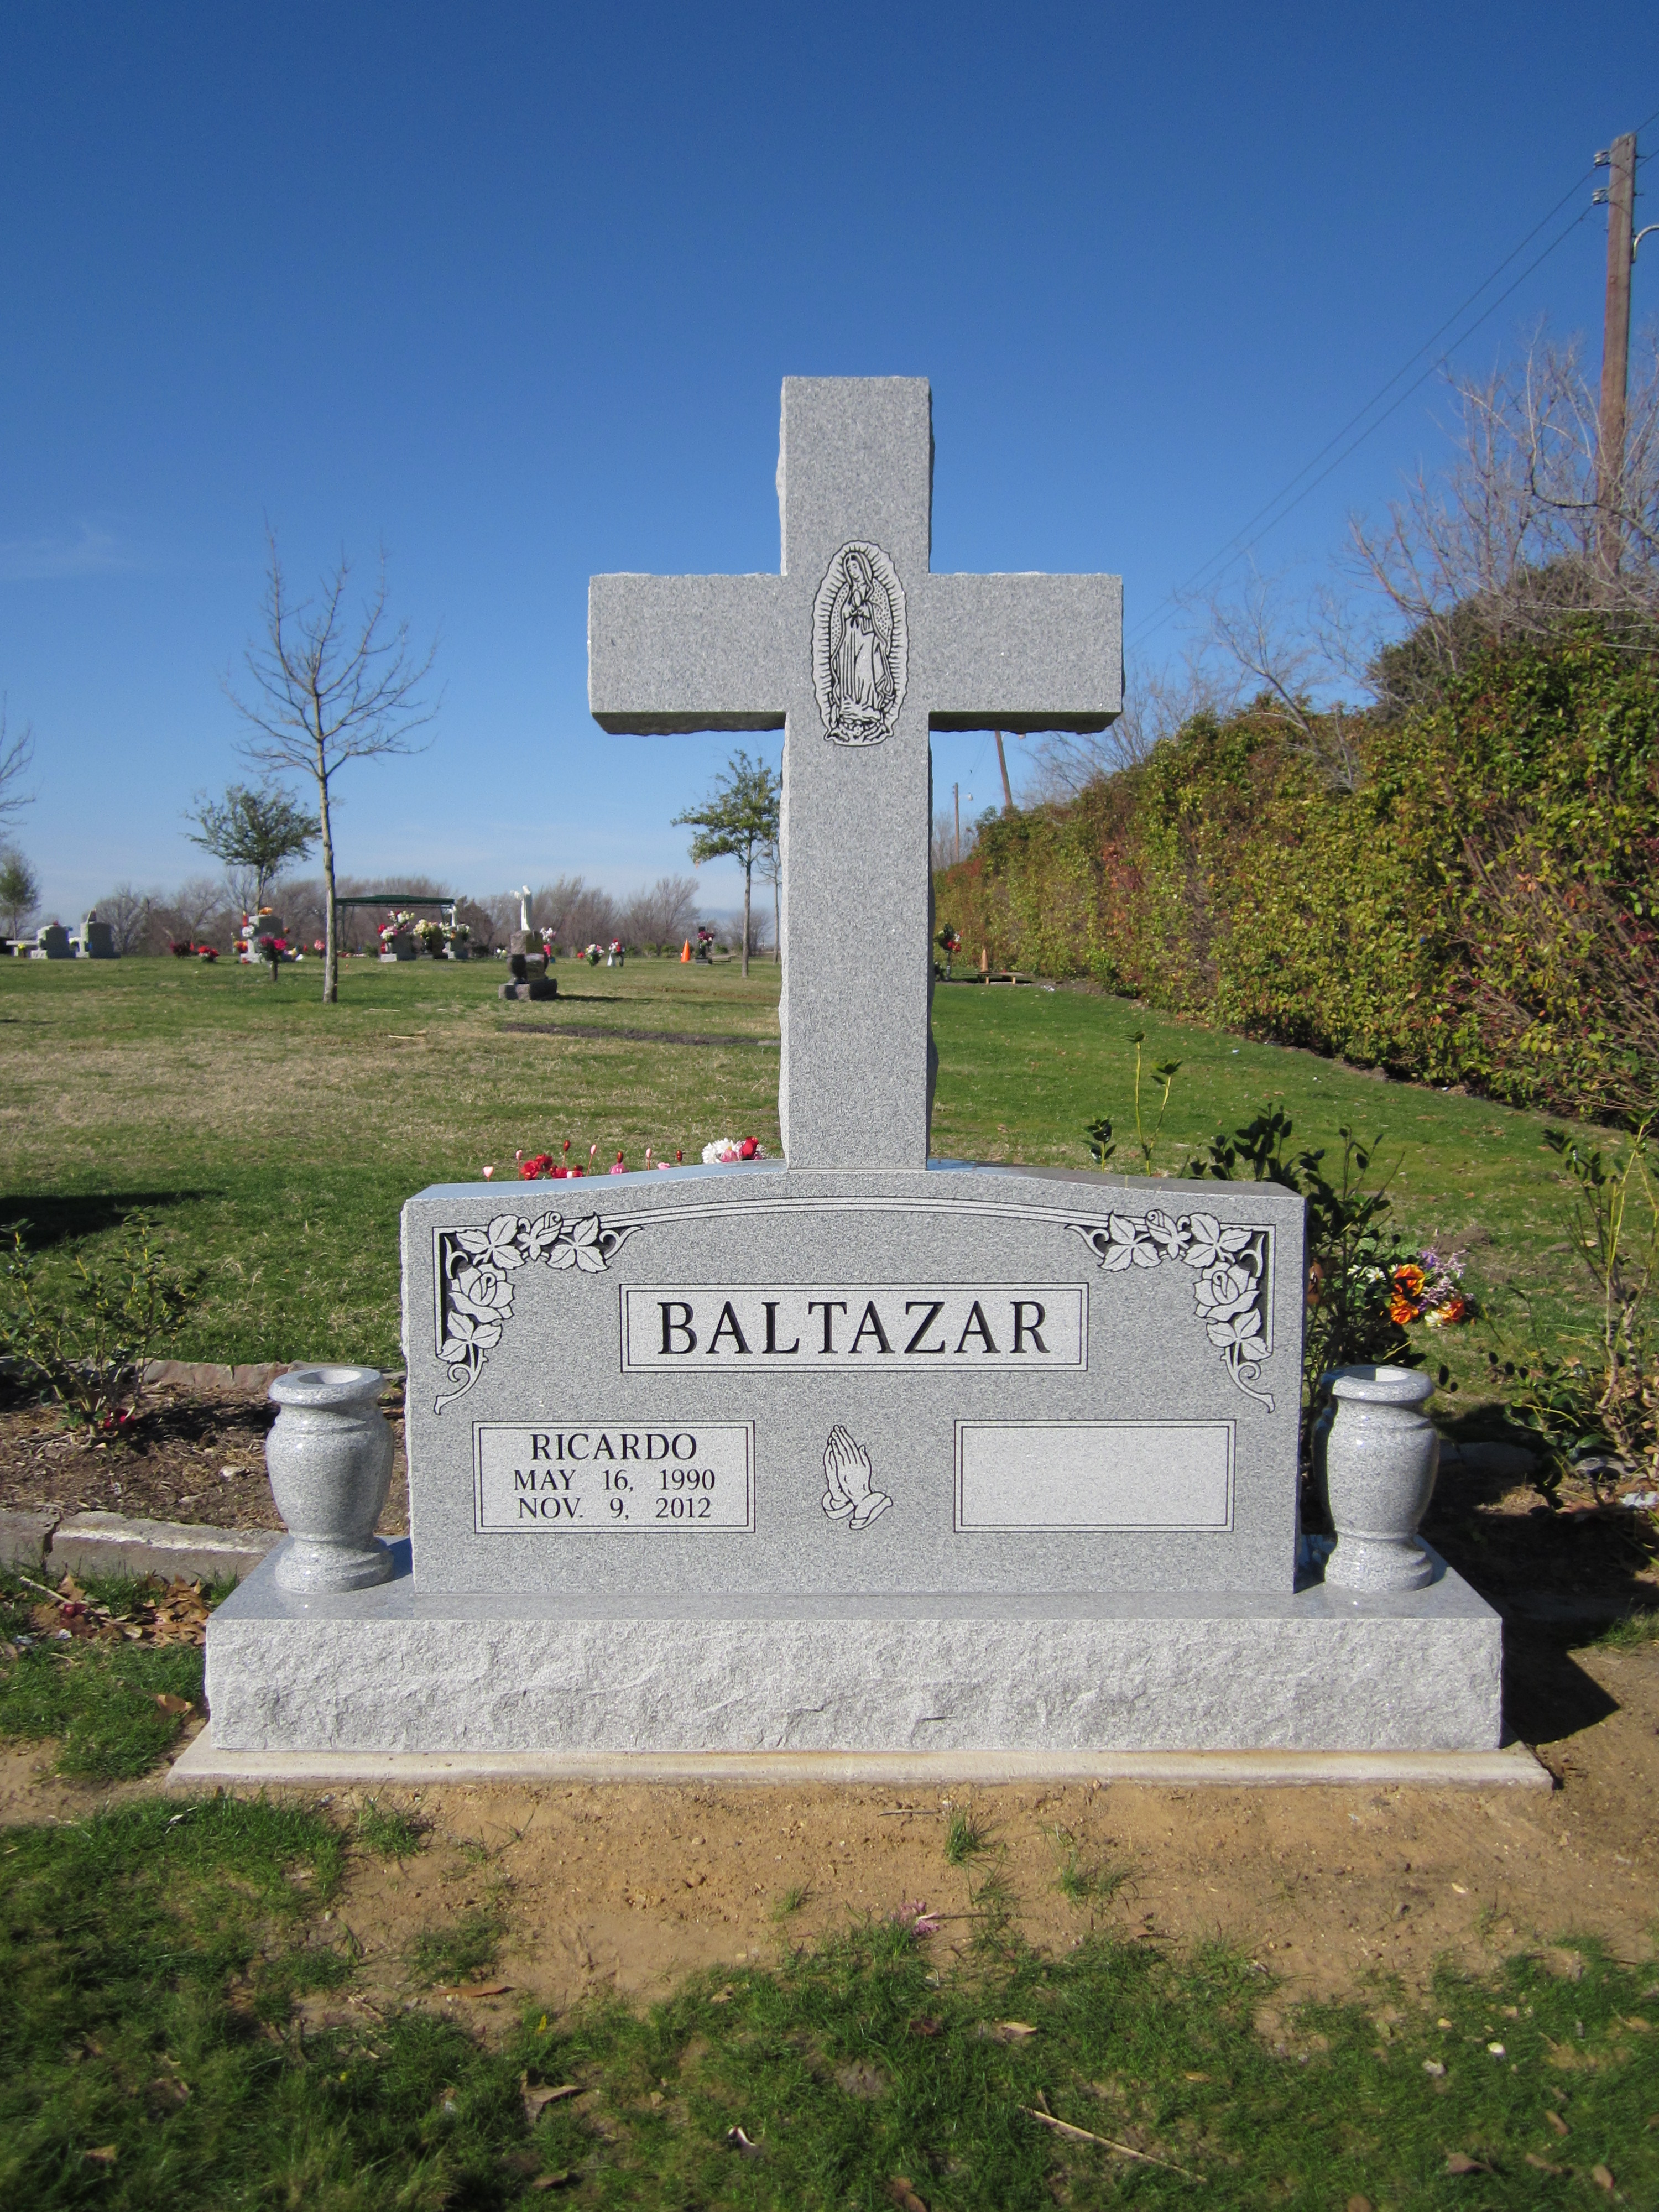 BALTAZAR,R